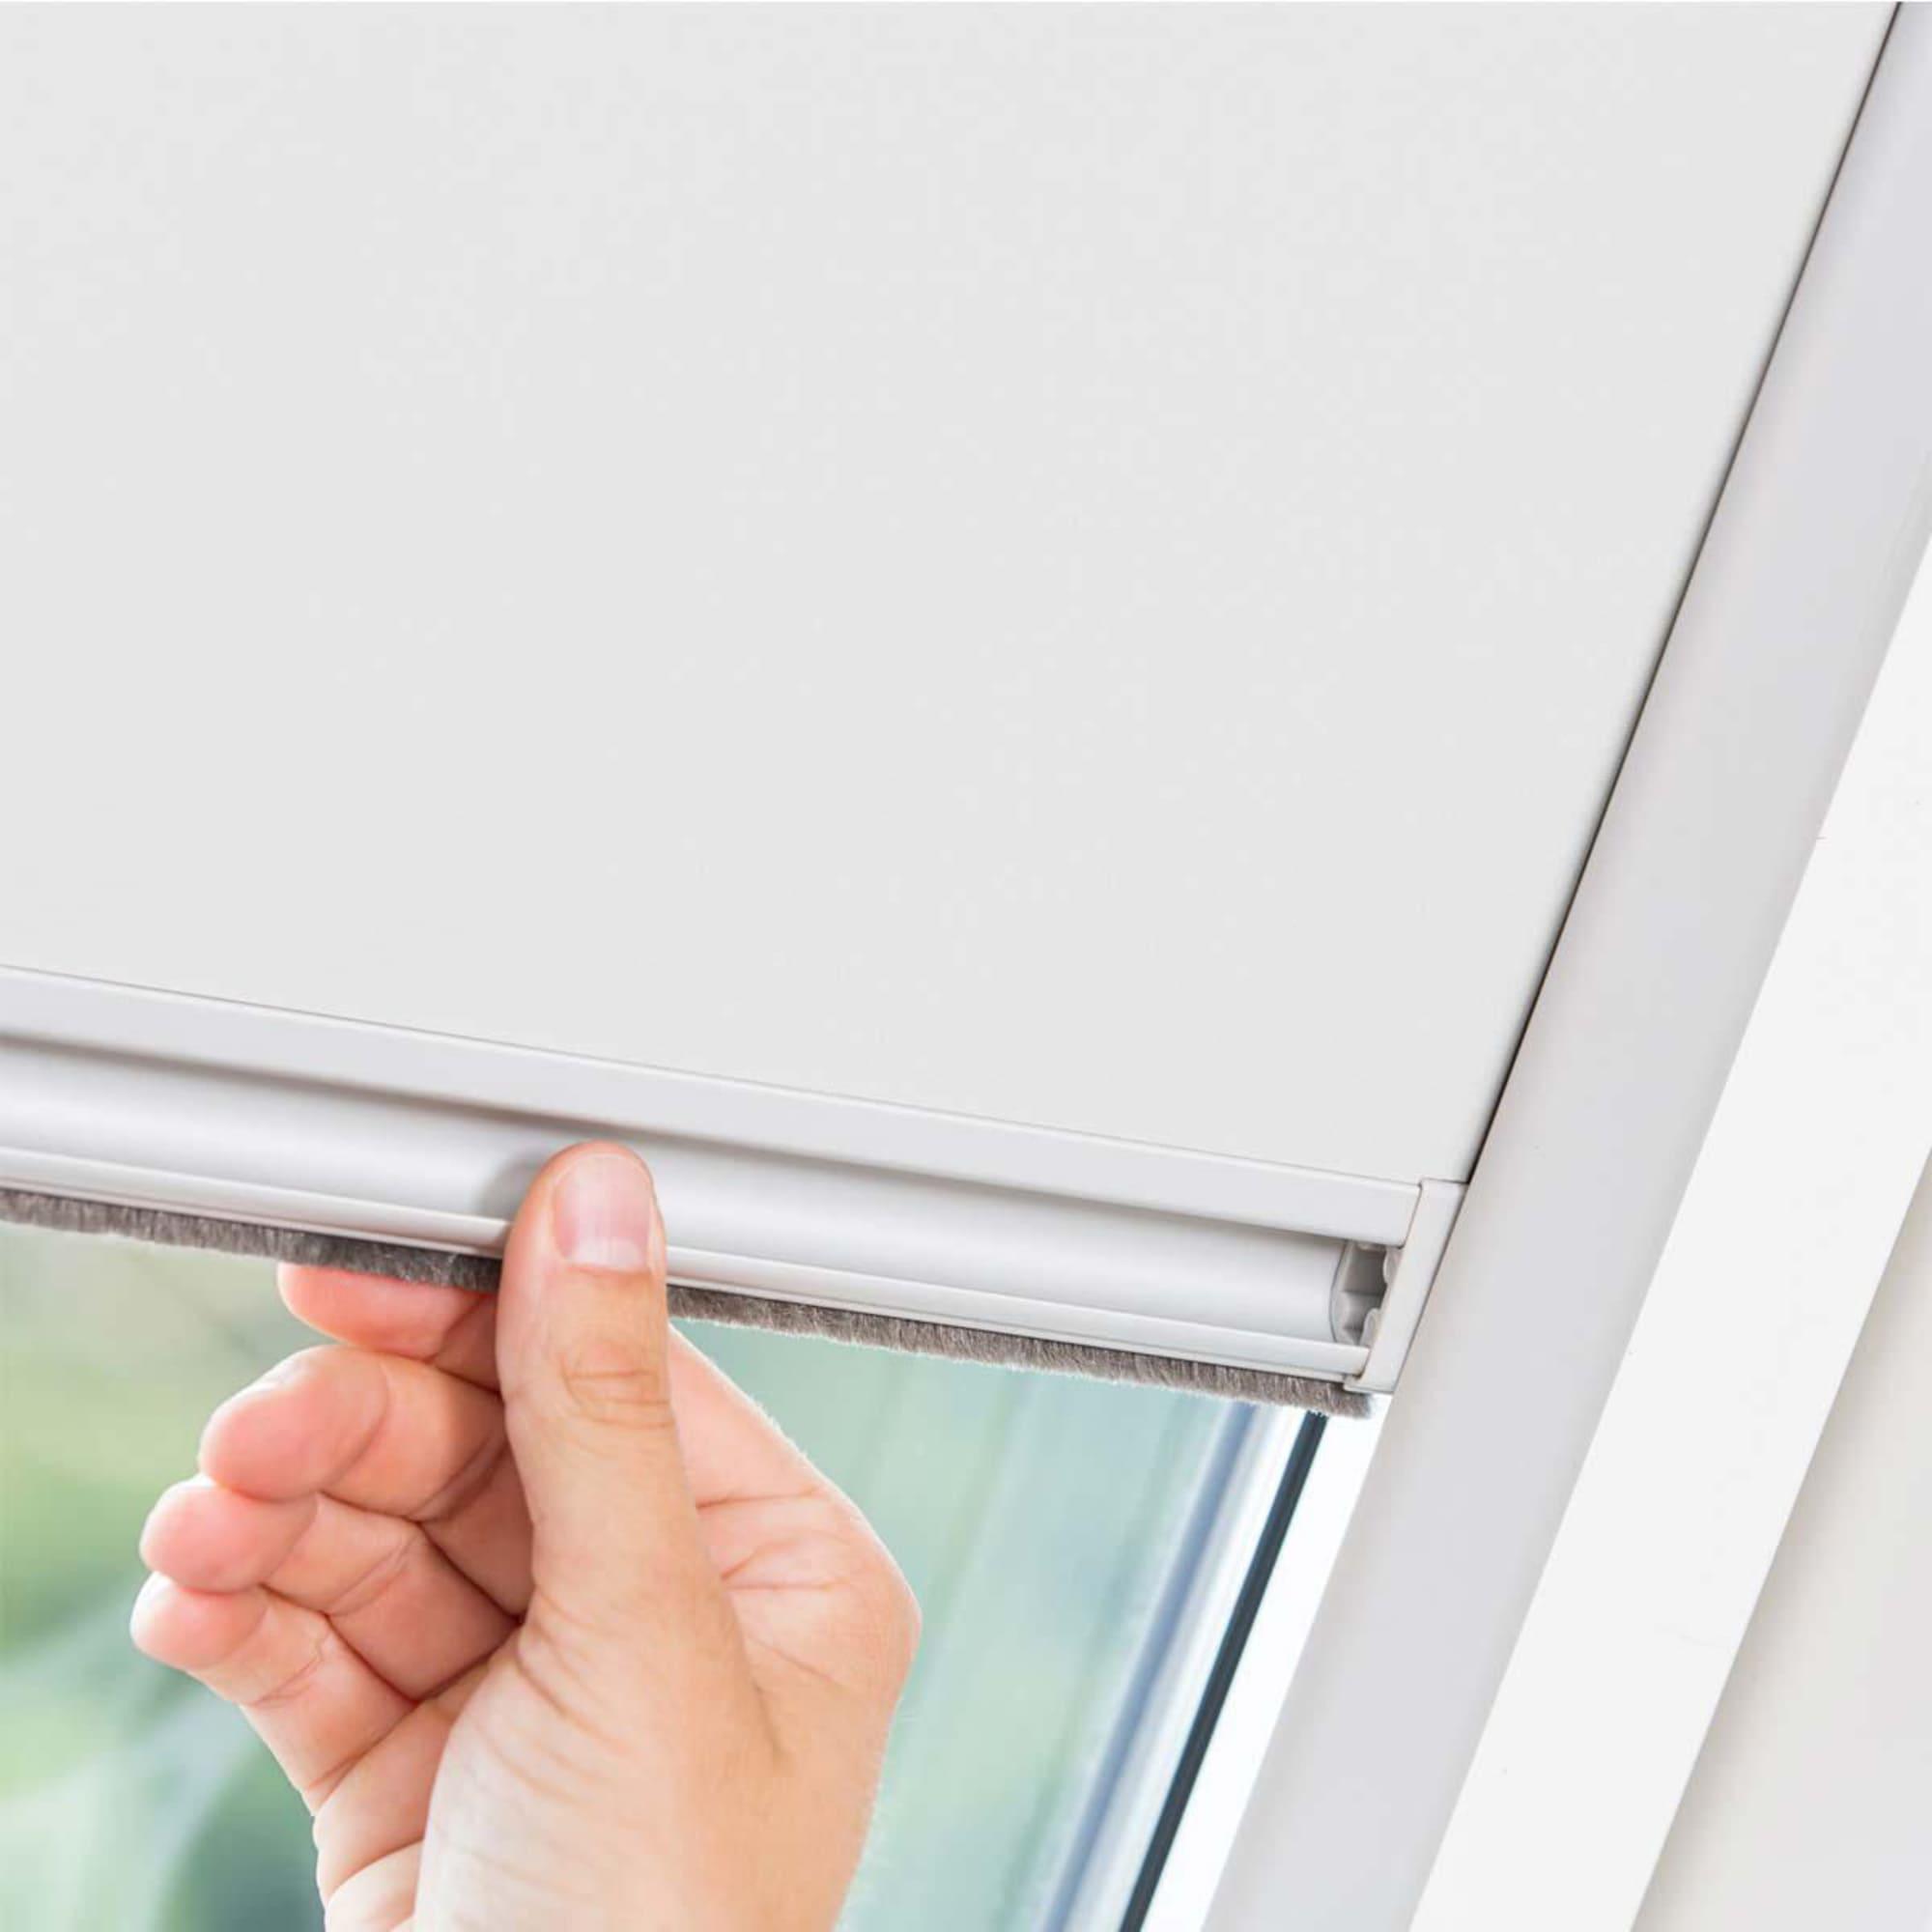 Dachfenster rollo stunning rollo fr velux dachfenster great affordable fenster rollos ohne with - Dachfensterrollo skylight ...